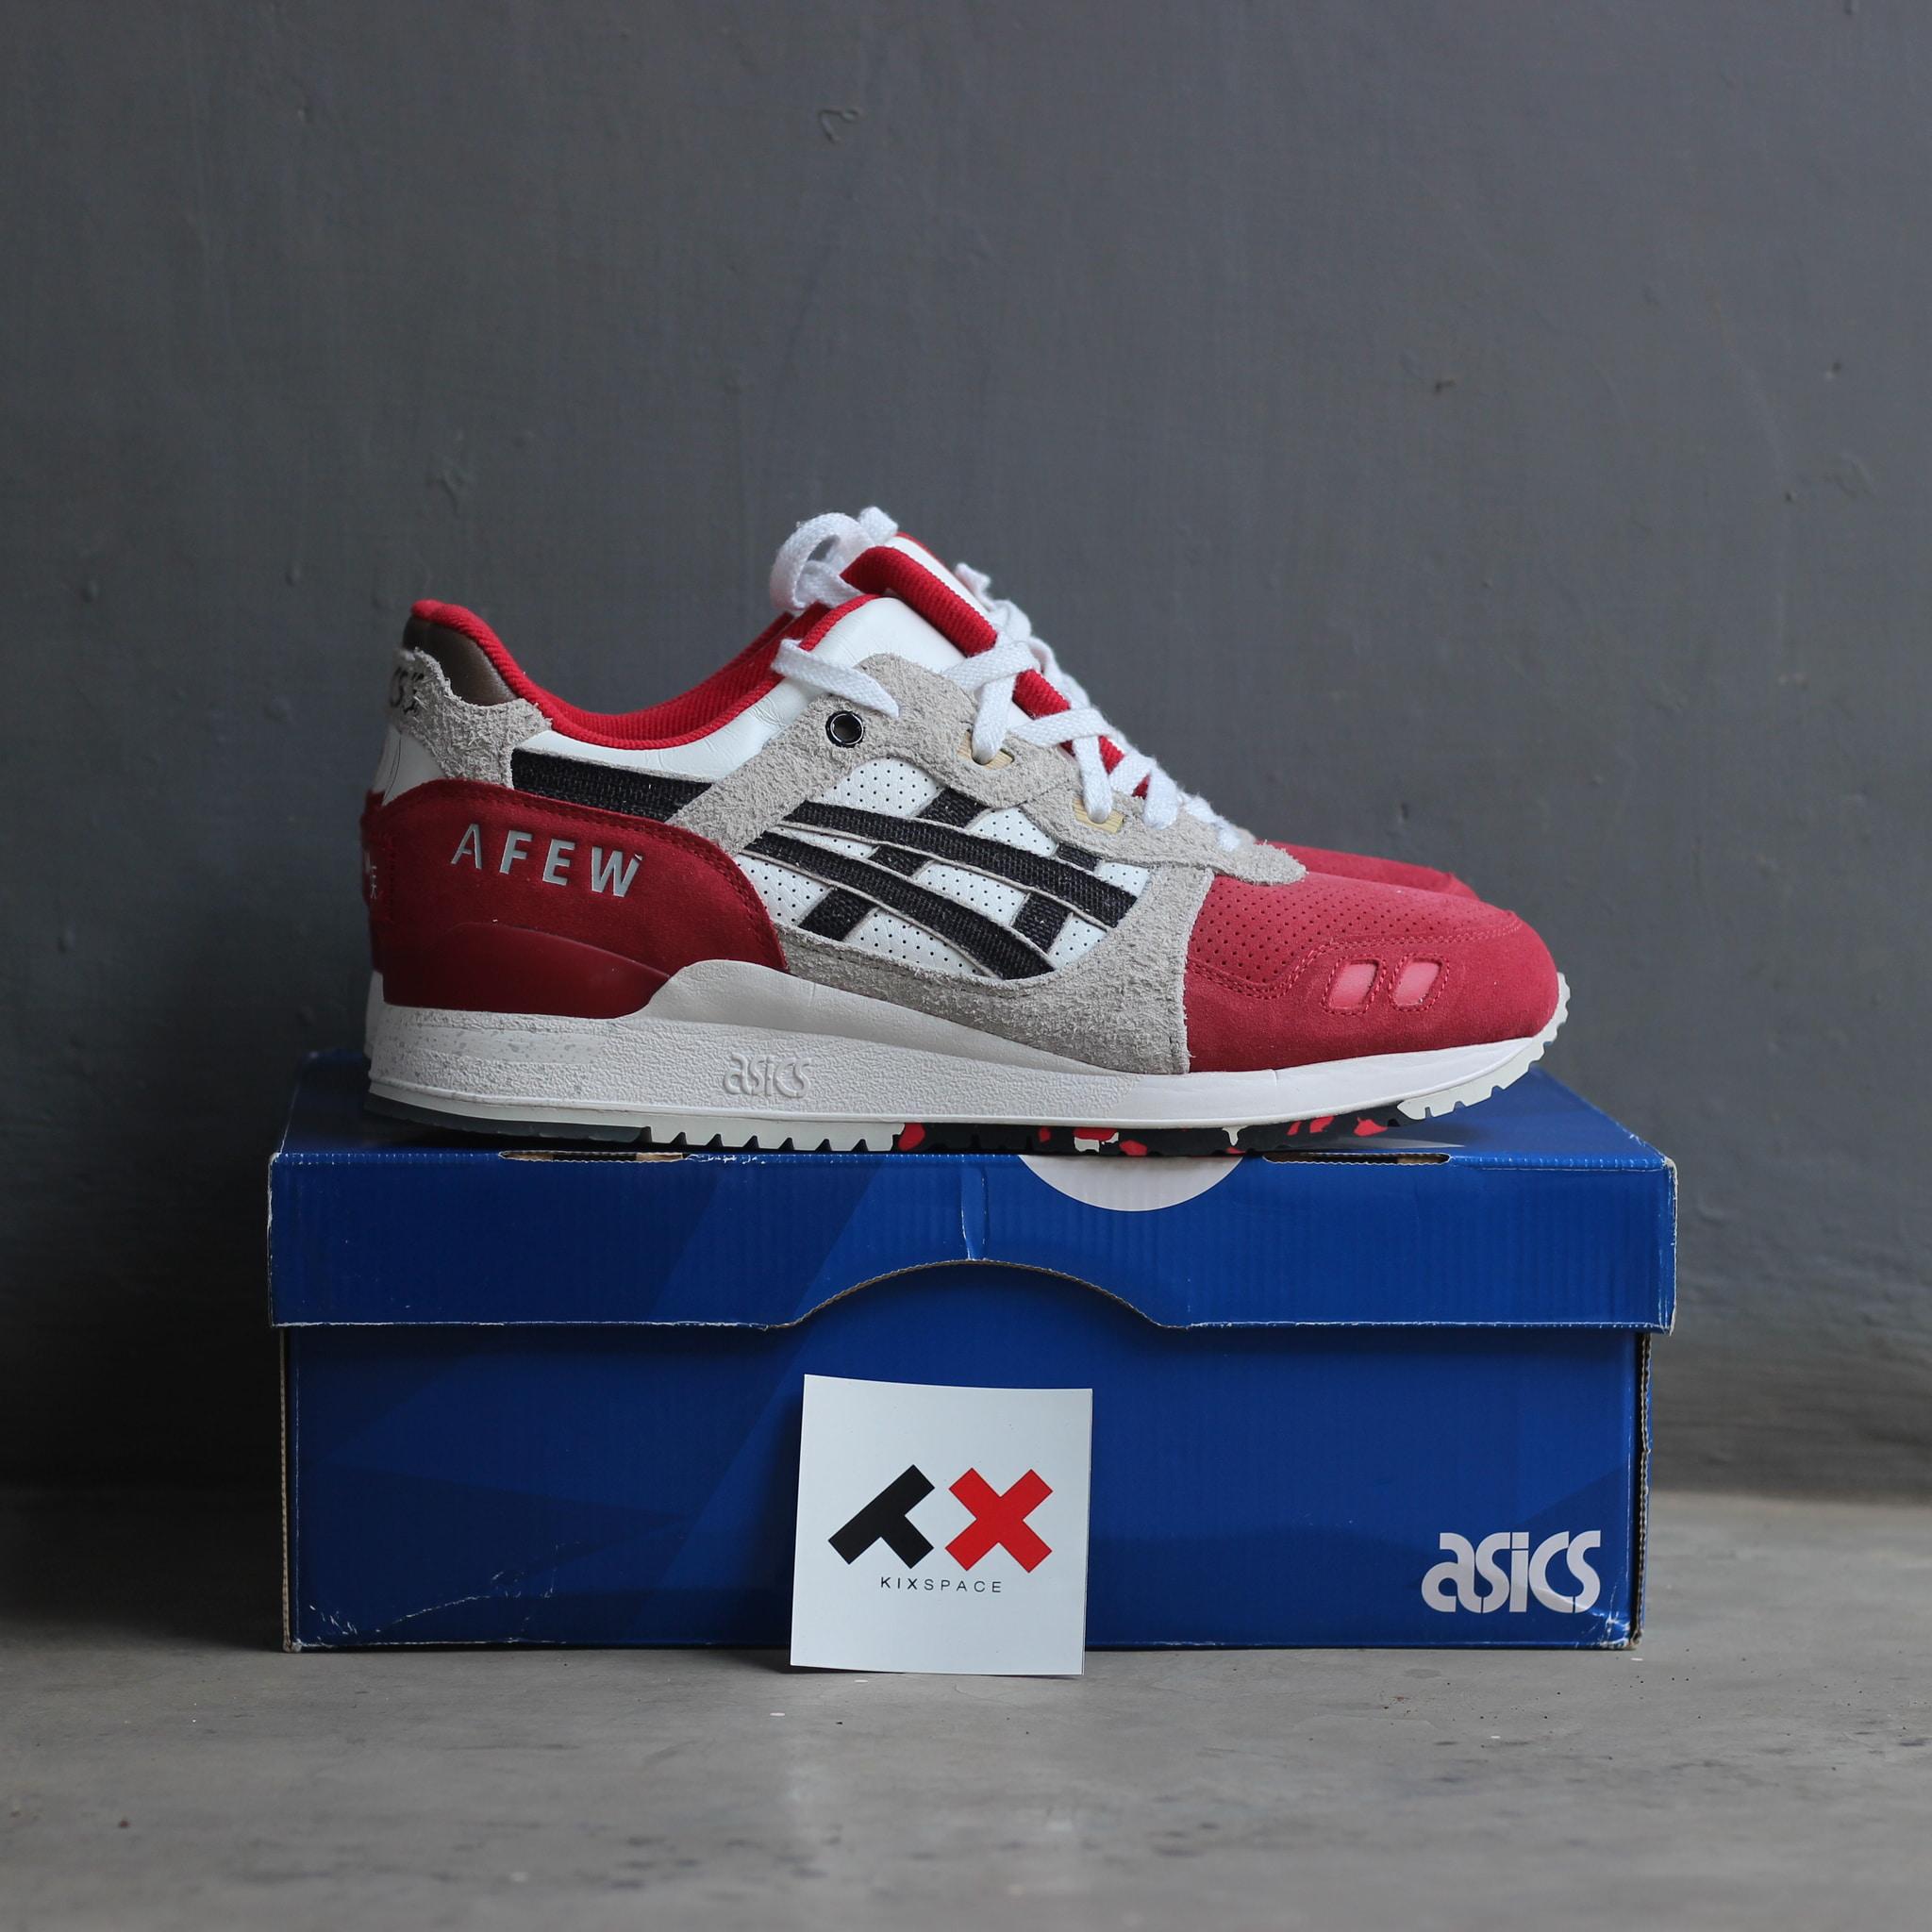 separation shoes fce6c dd79d Jual (ORIGINAL) ASICS GEL LYTE III x AFEW